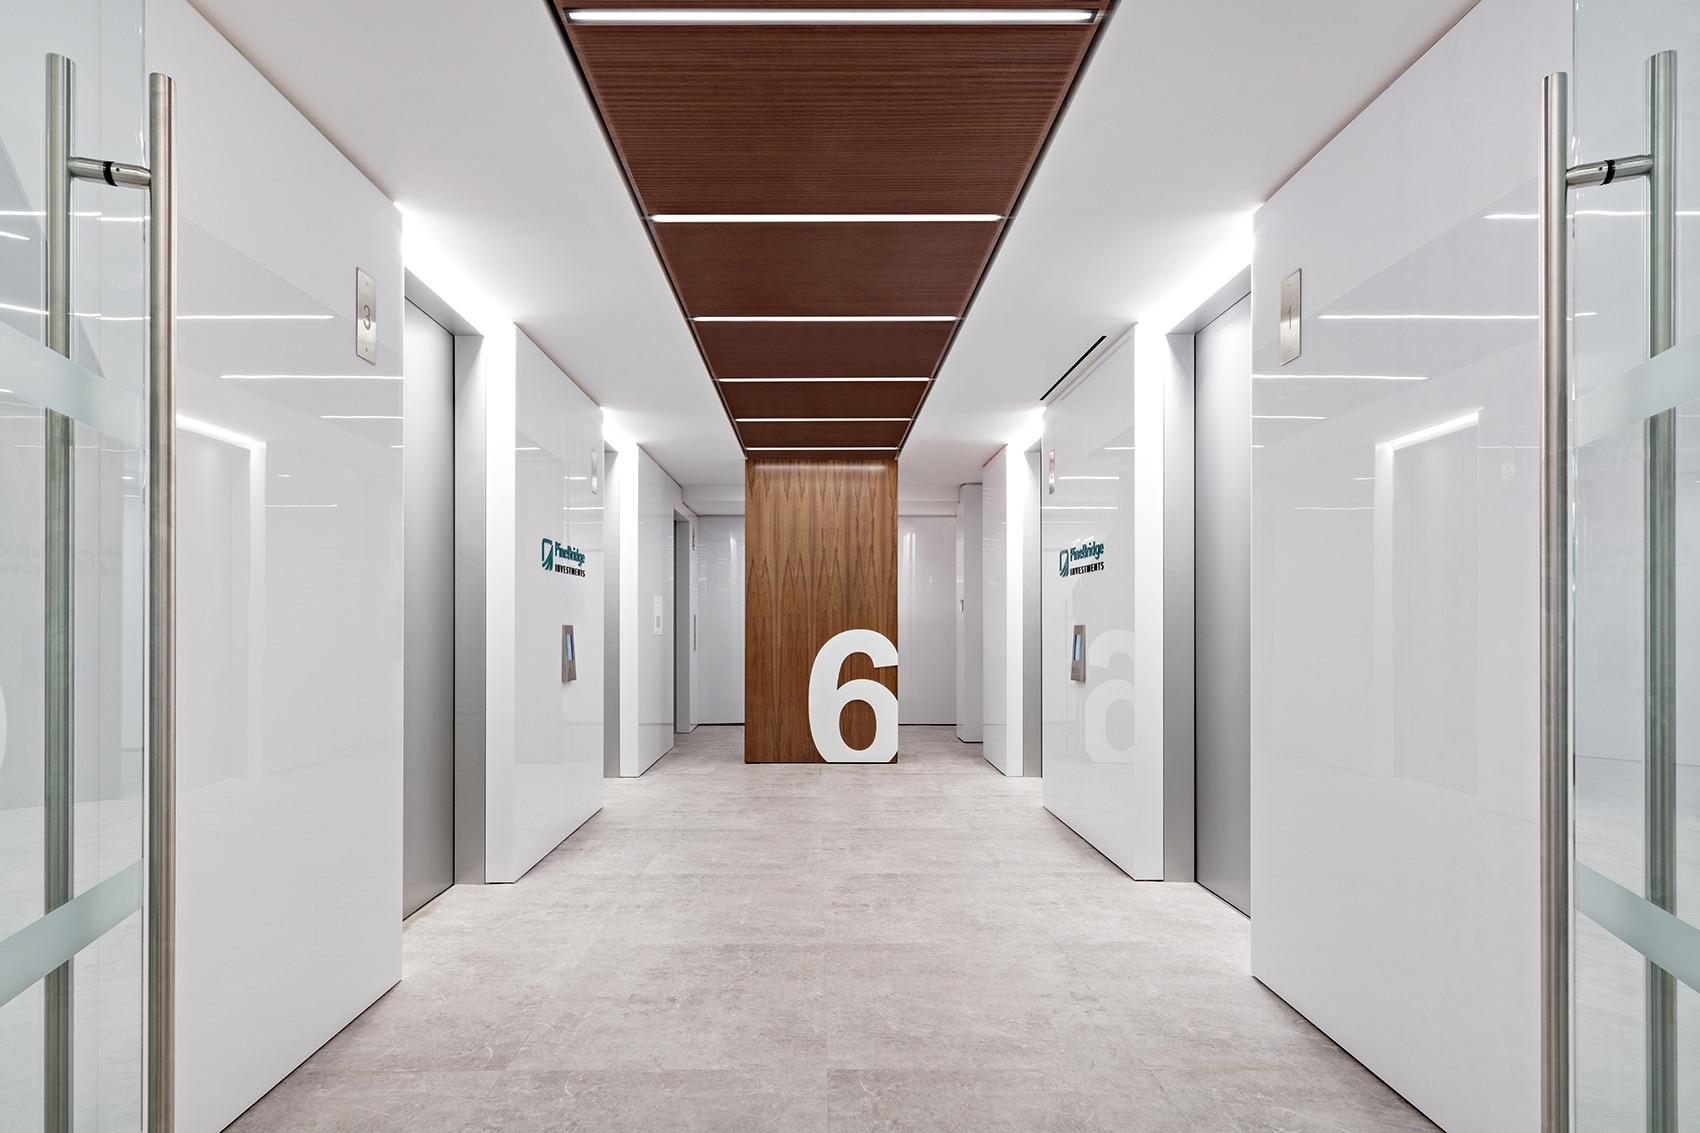 pine-bridge-investments-office-1